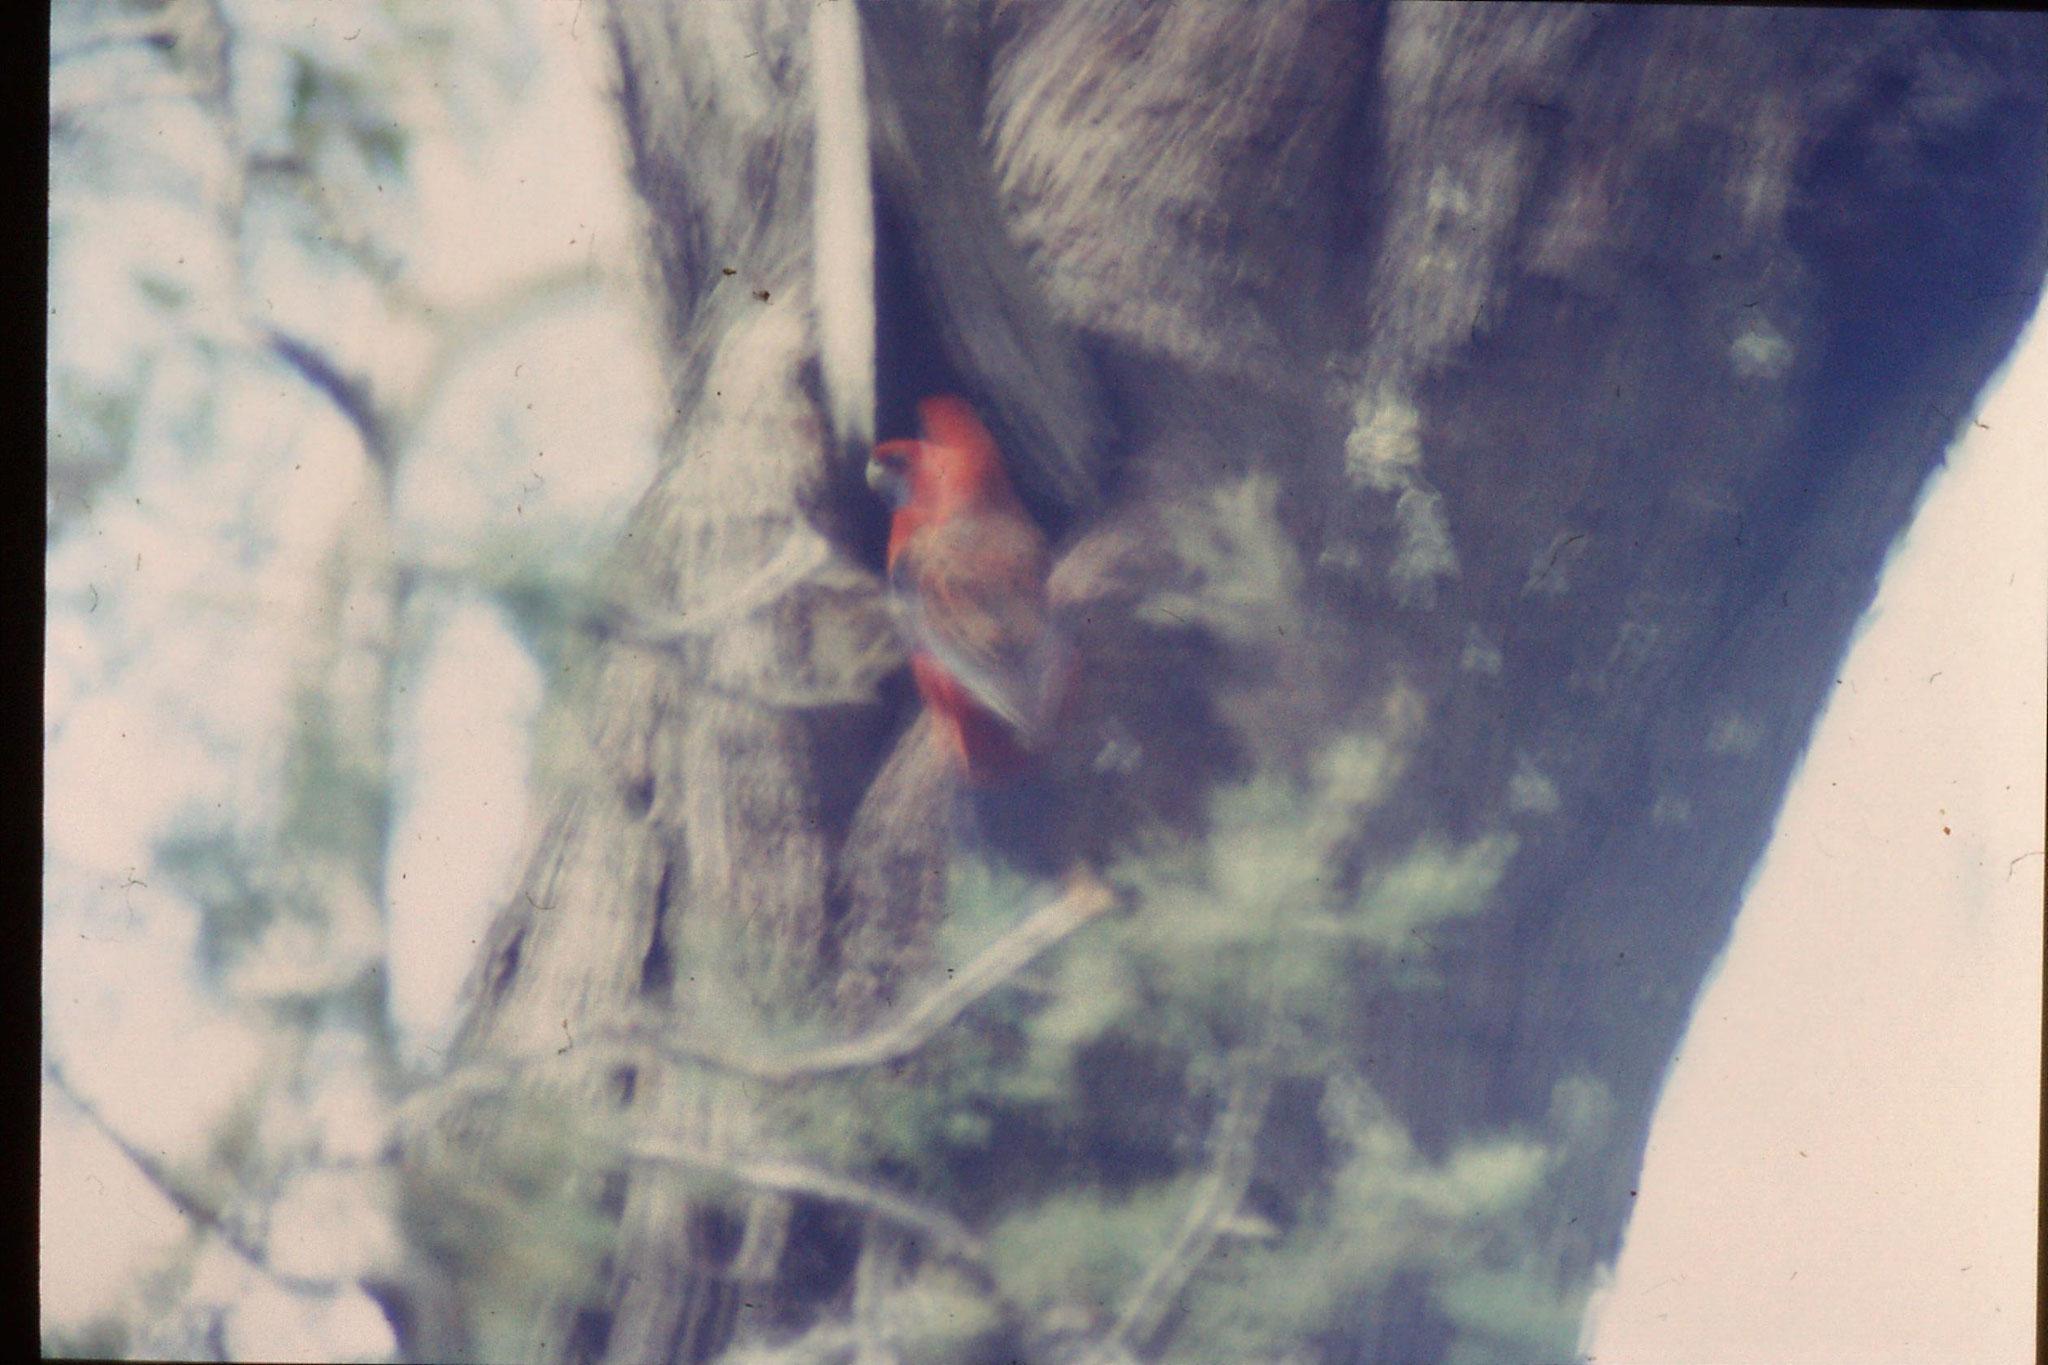 21/9/1990: 0: near Sundial picnic gound, crimson rosella